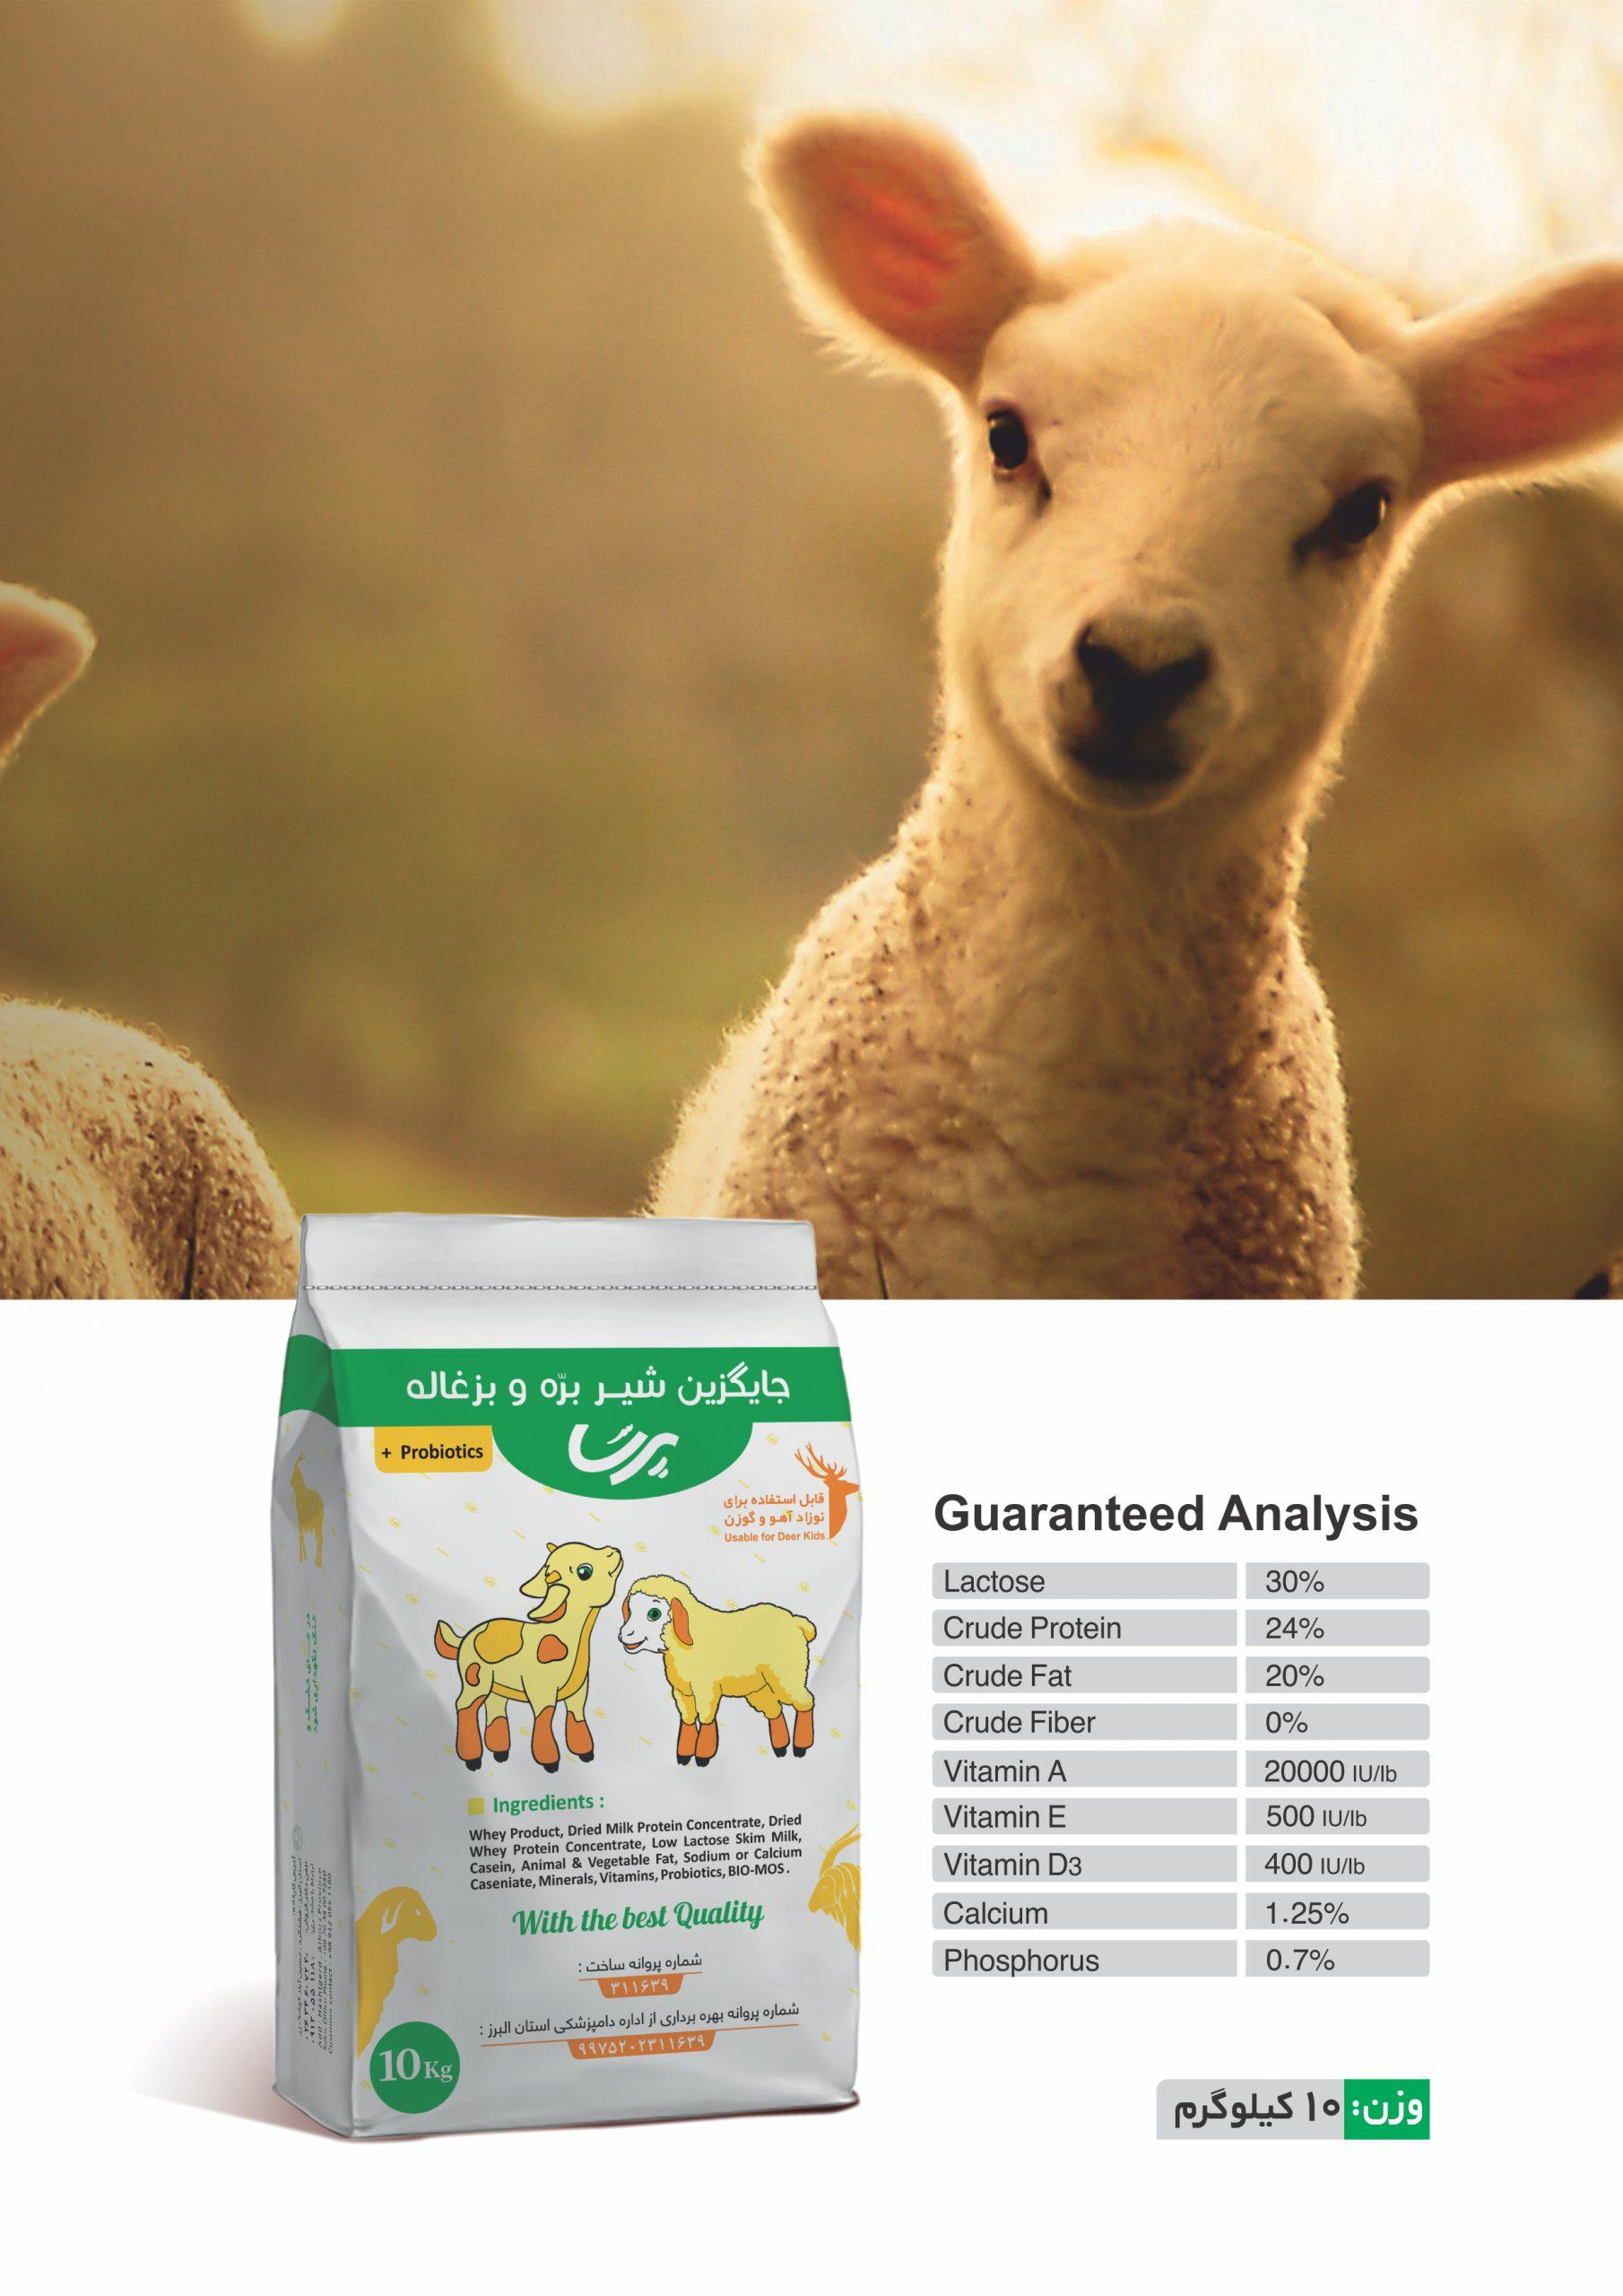 Lamb and goat milk replacer